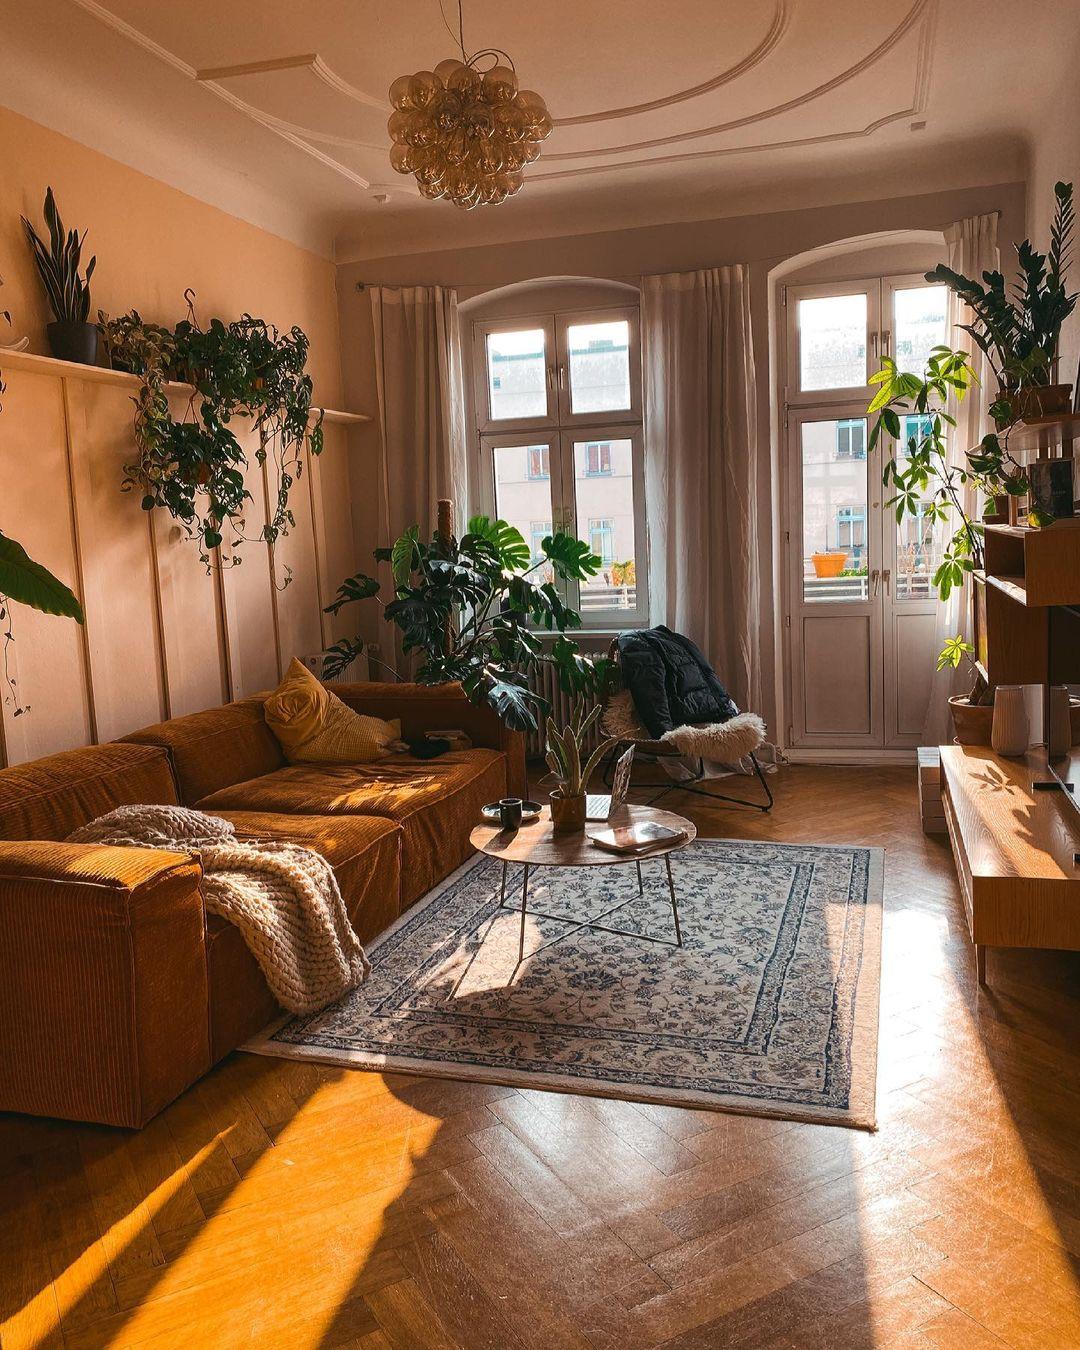 One Bedroom Apartment Decorating Ideas, 1 Bedroom Living Room Ideas